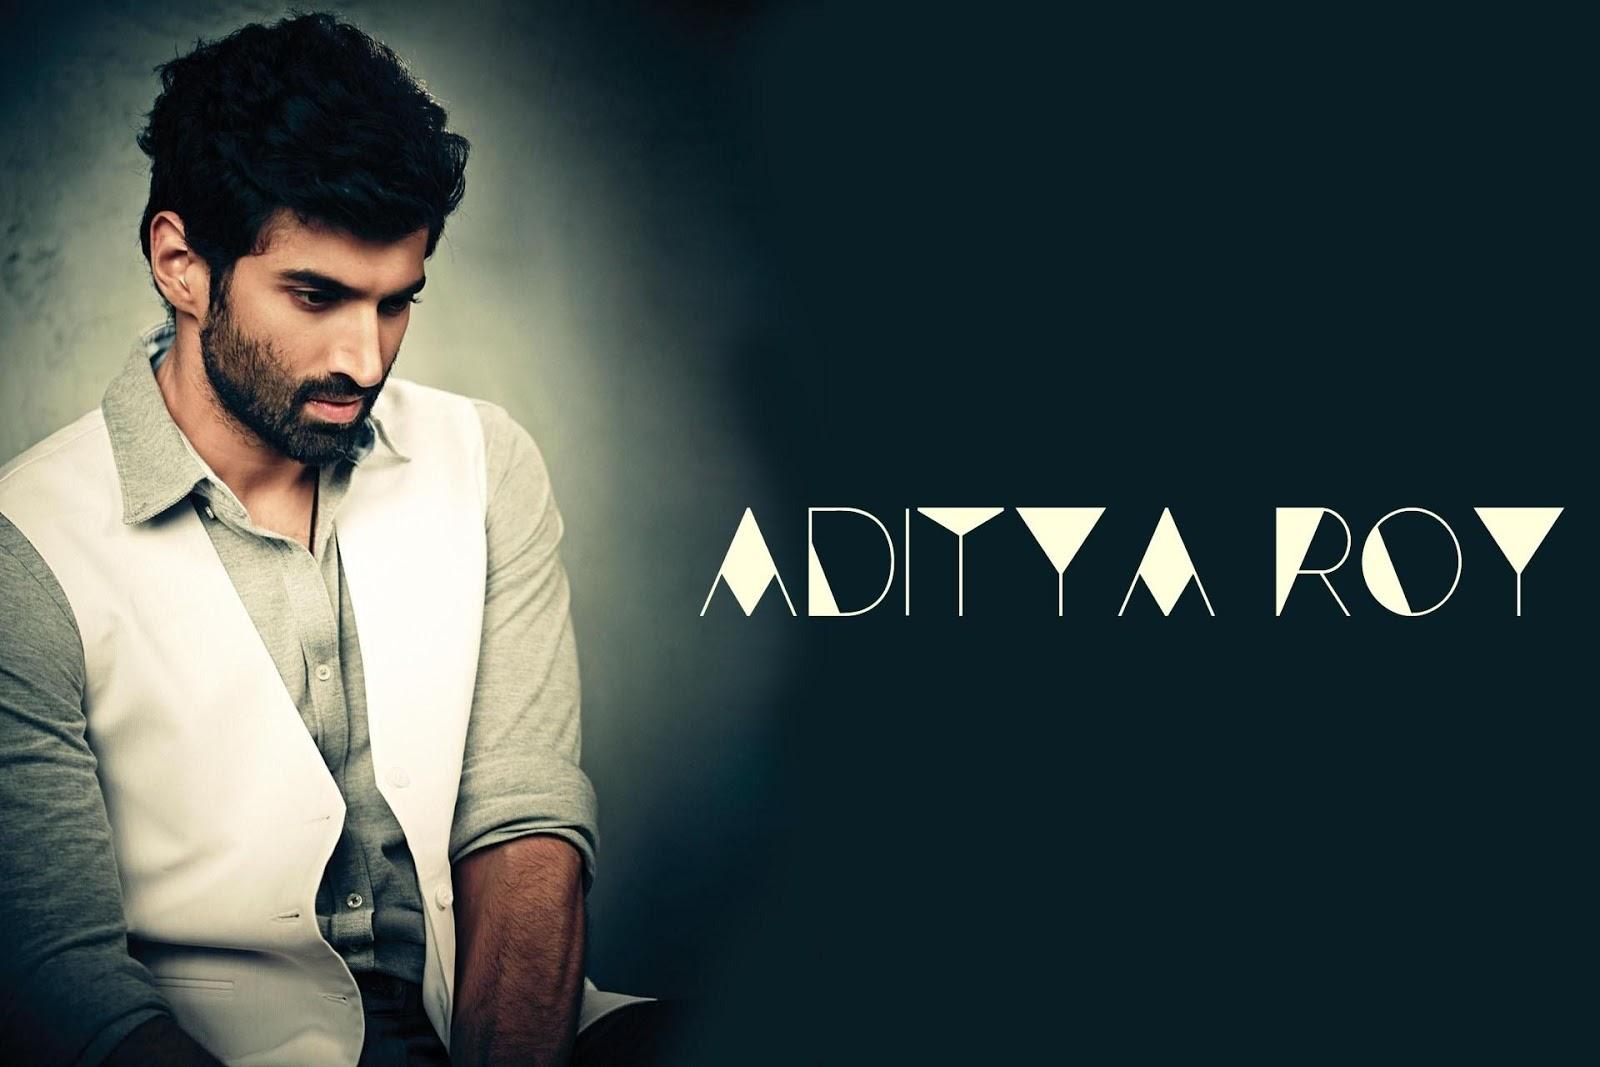 Aditya Roy Kapoor Hd Wallpaper: 51 Top Hd Wallpaper: Aditya Roy Kapoor HD Wallpaper Free